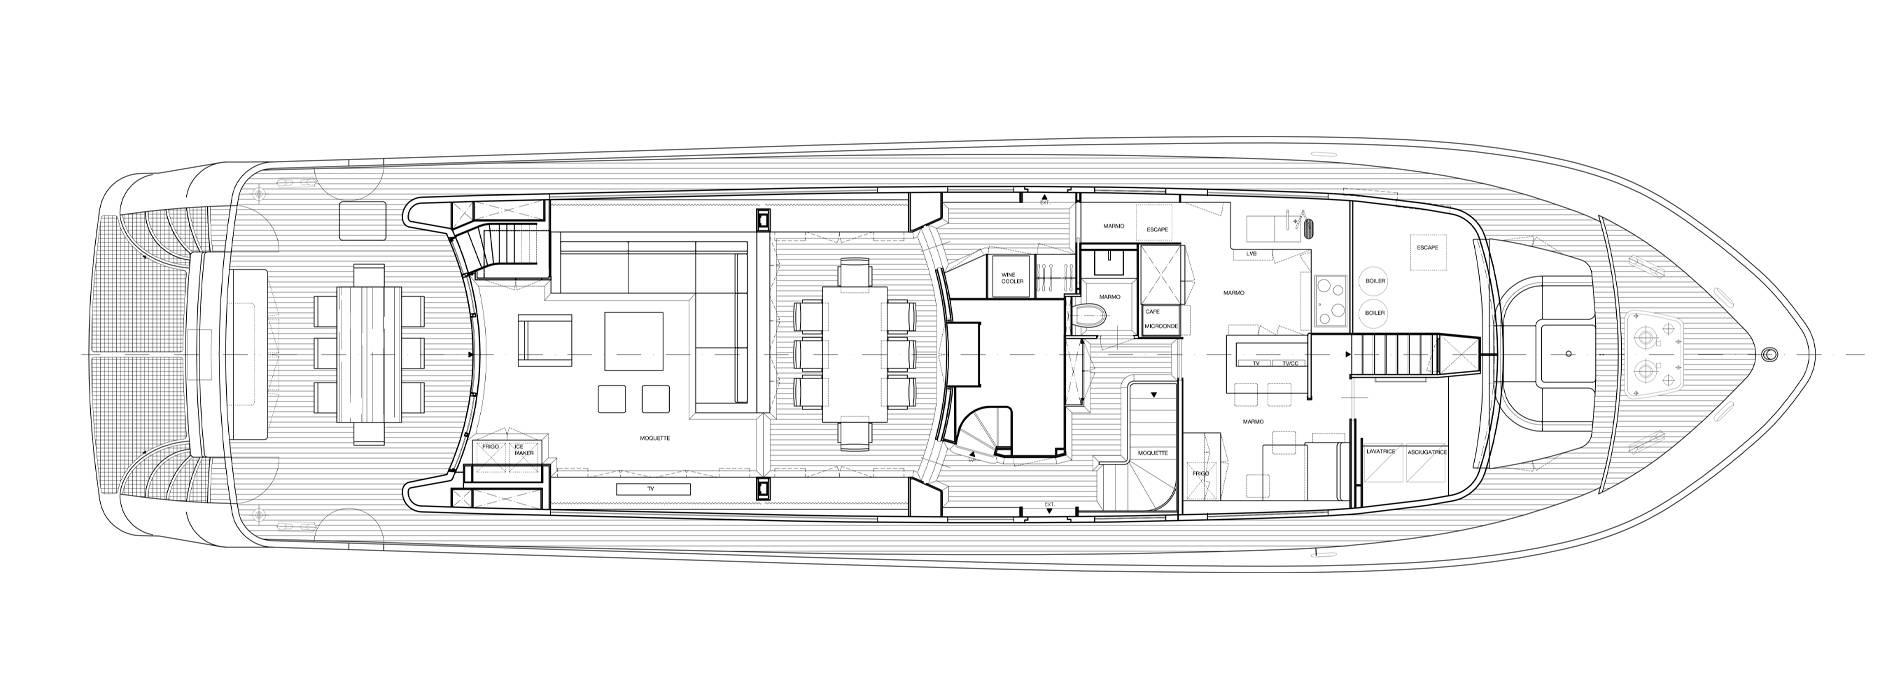 Sanlorenzo Yachts SL88-541 Hauptdeck